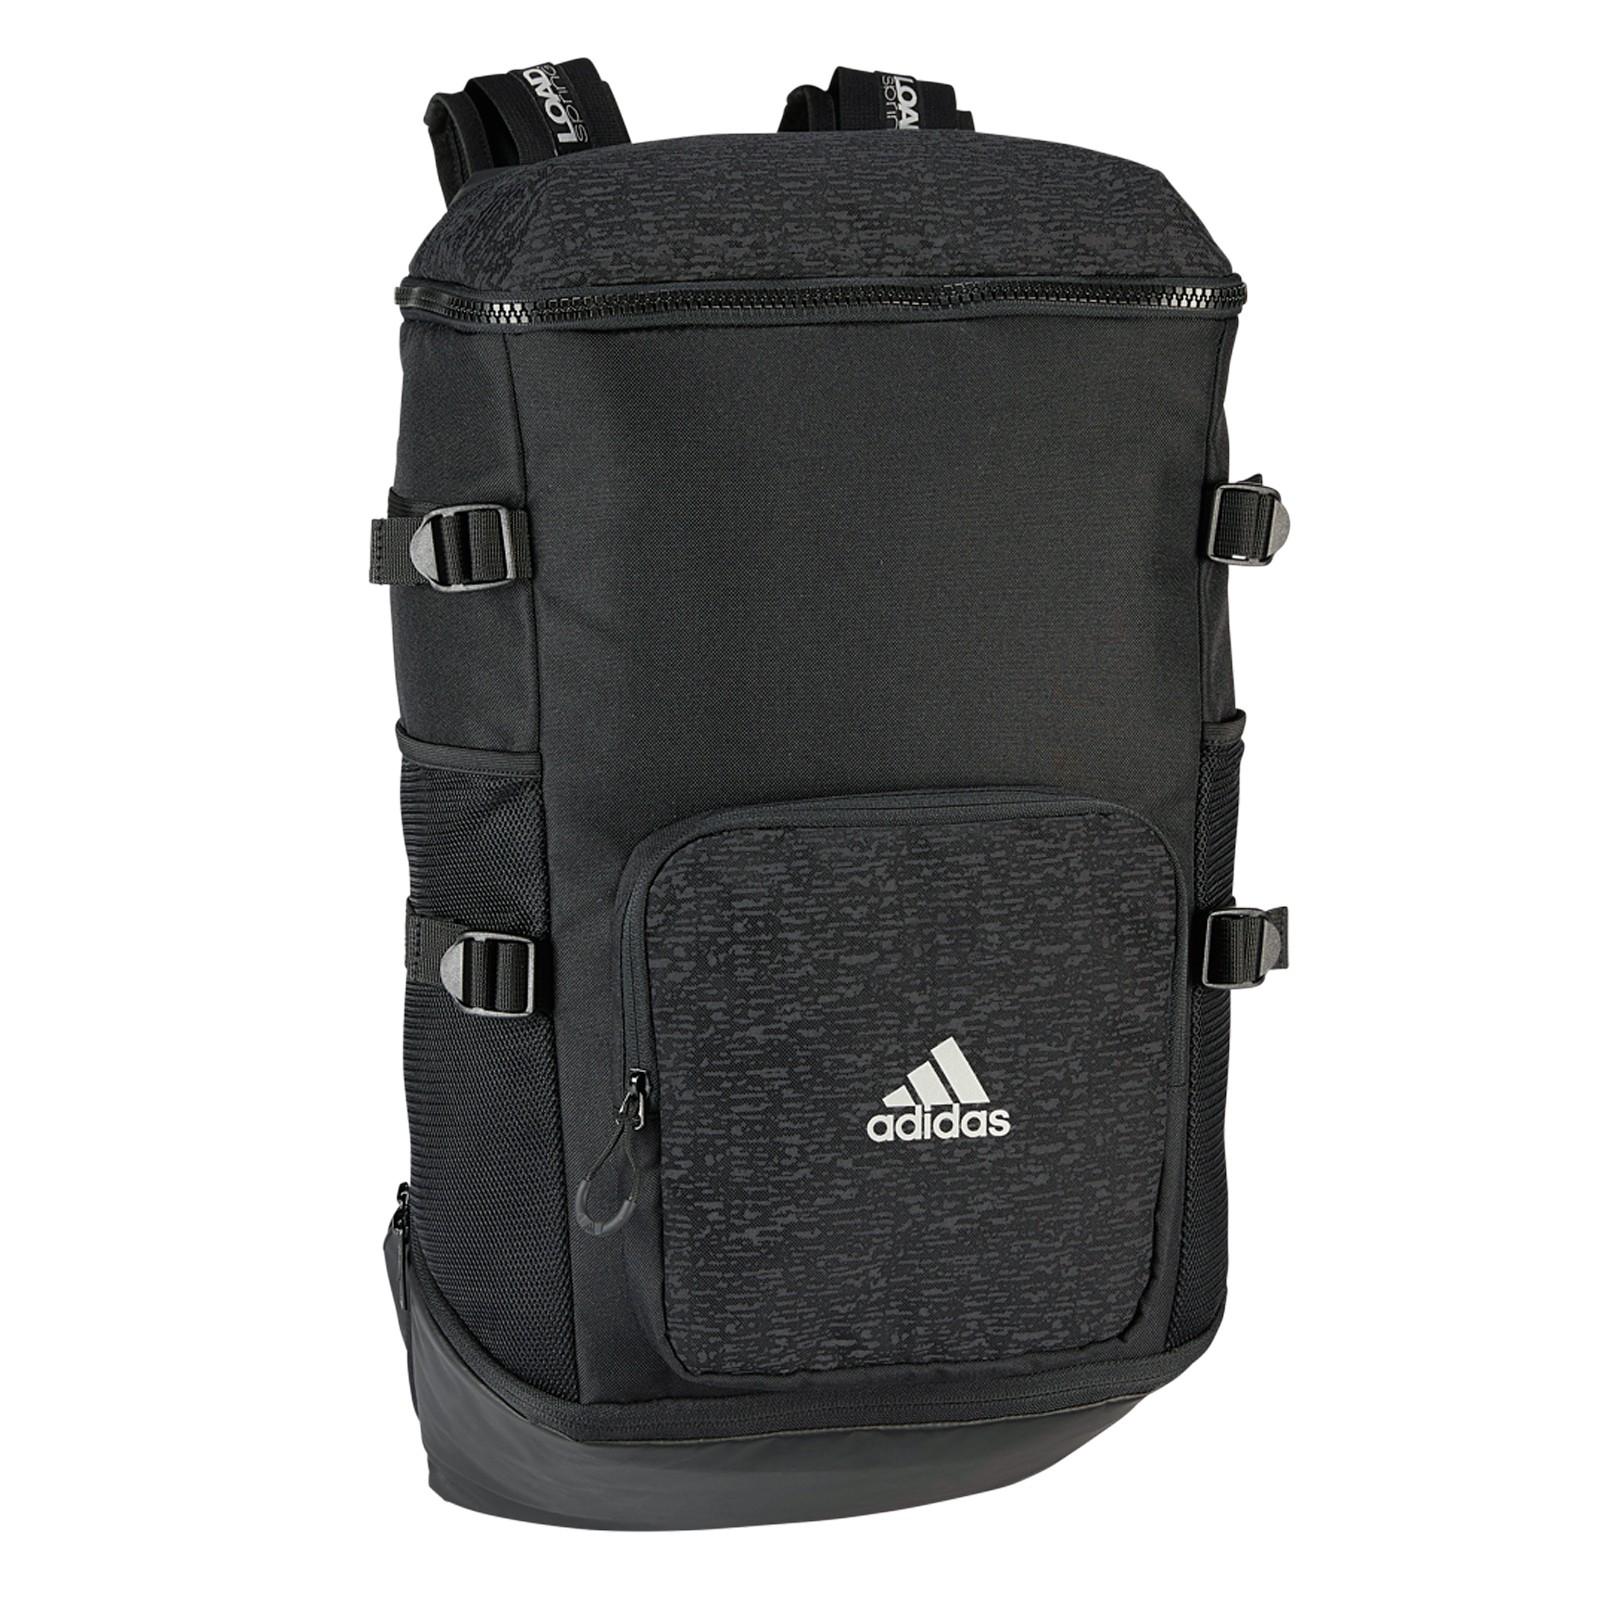 Bags adidas Rucksack Back Pack